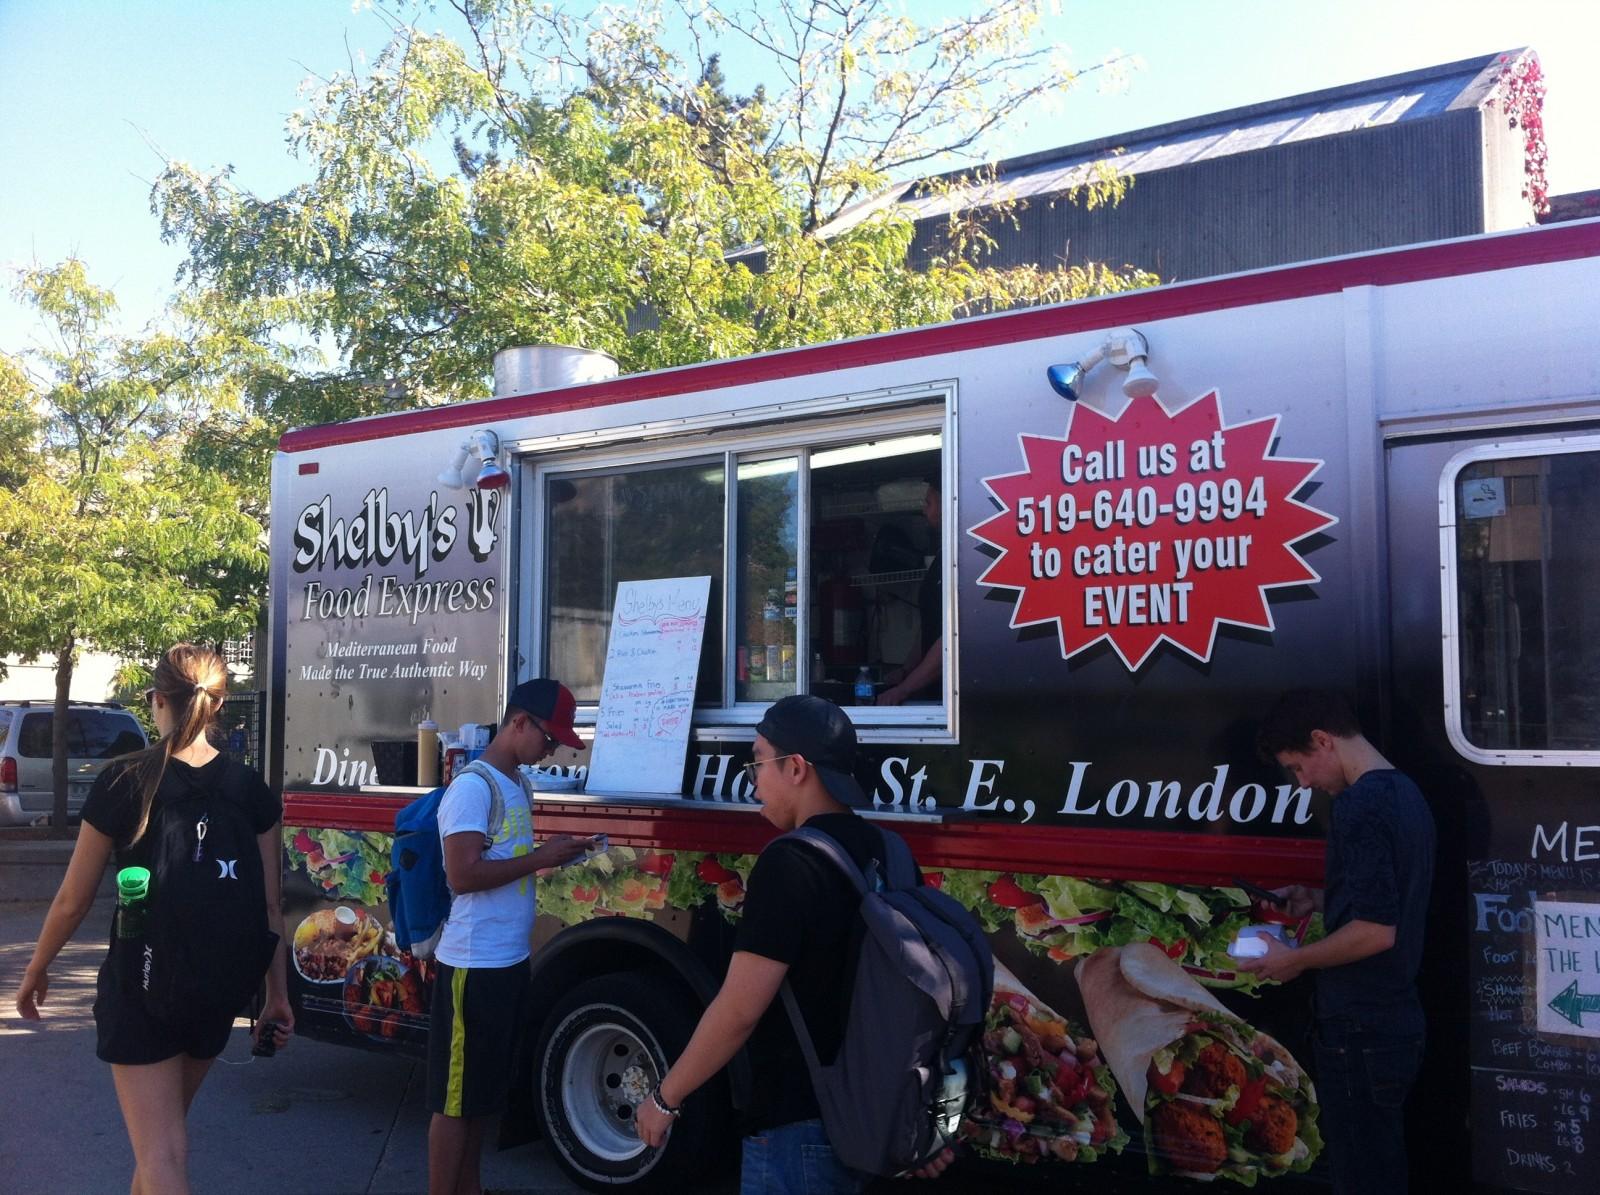 Food trucks should look beyond city streets